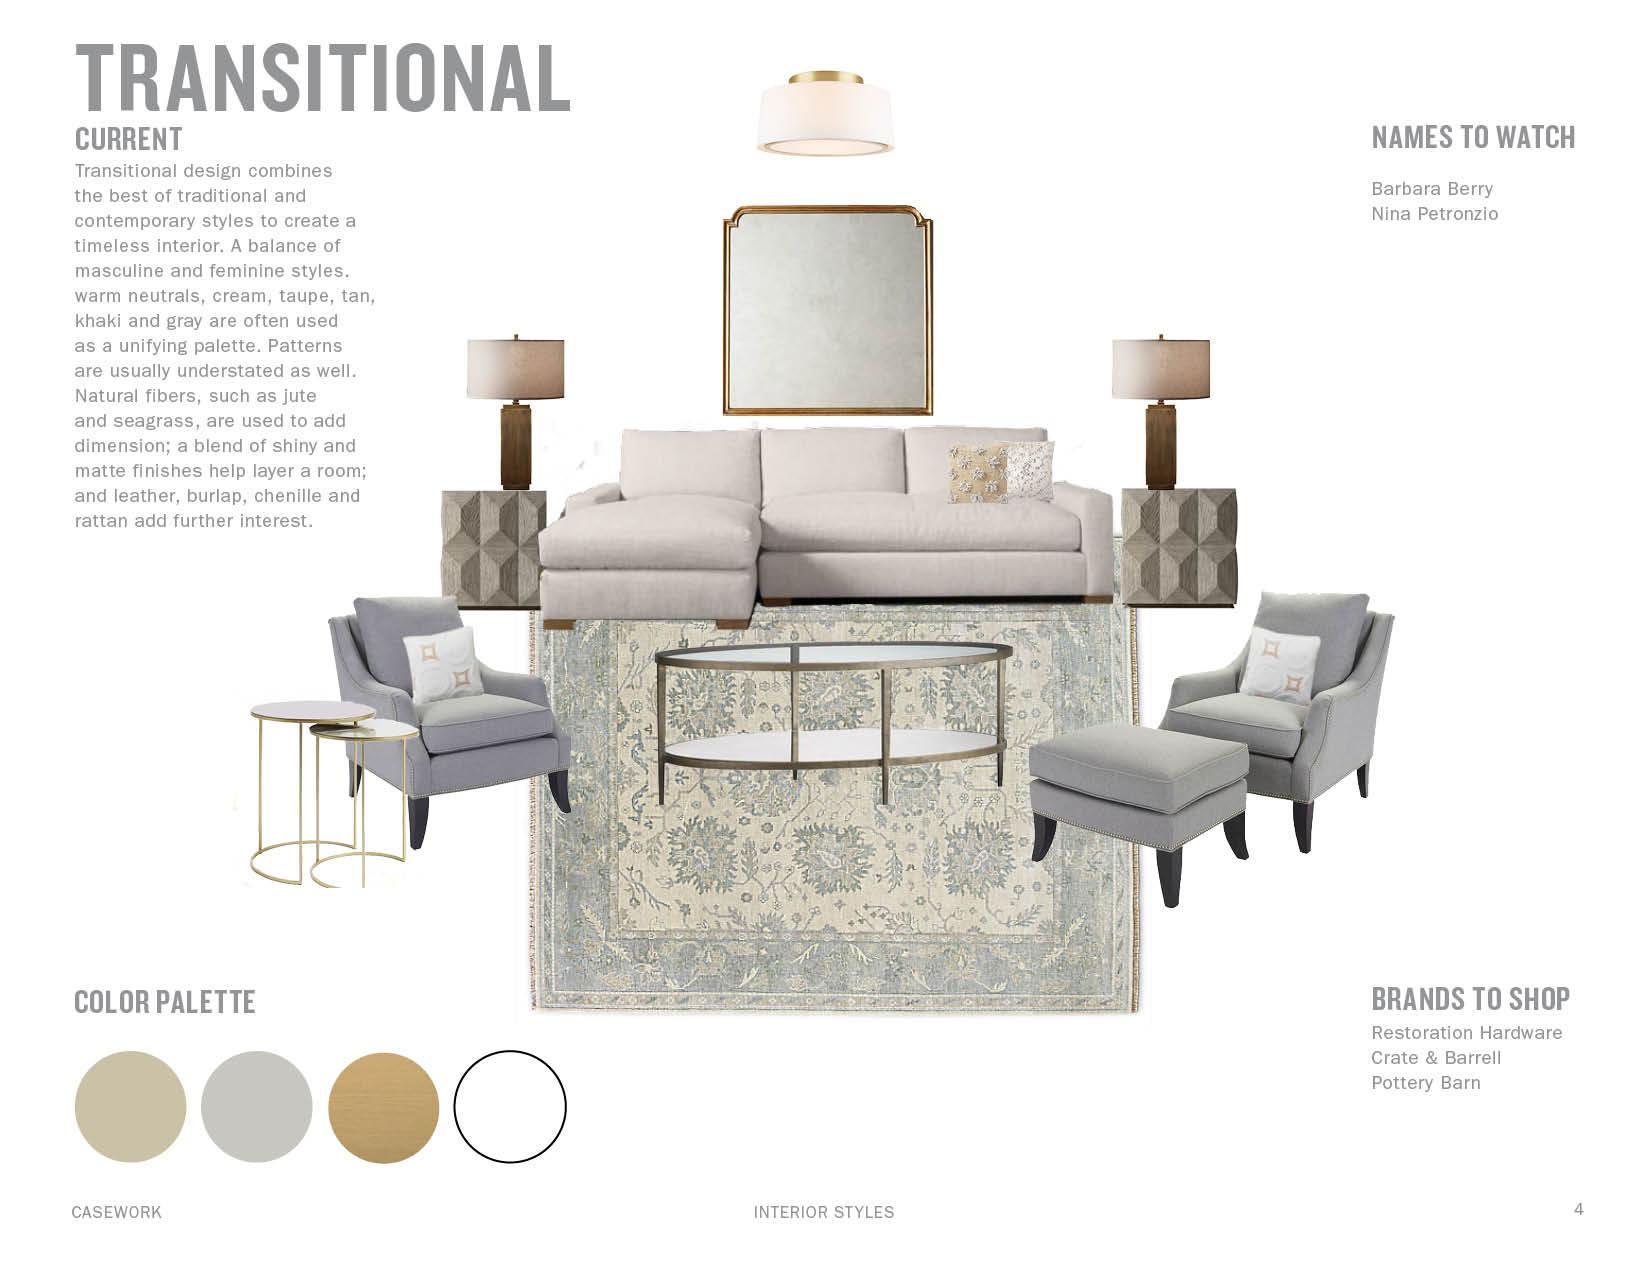 Interior Style Basics A Breakdown Of Top Interior Styles Skillshare Projects